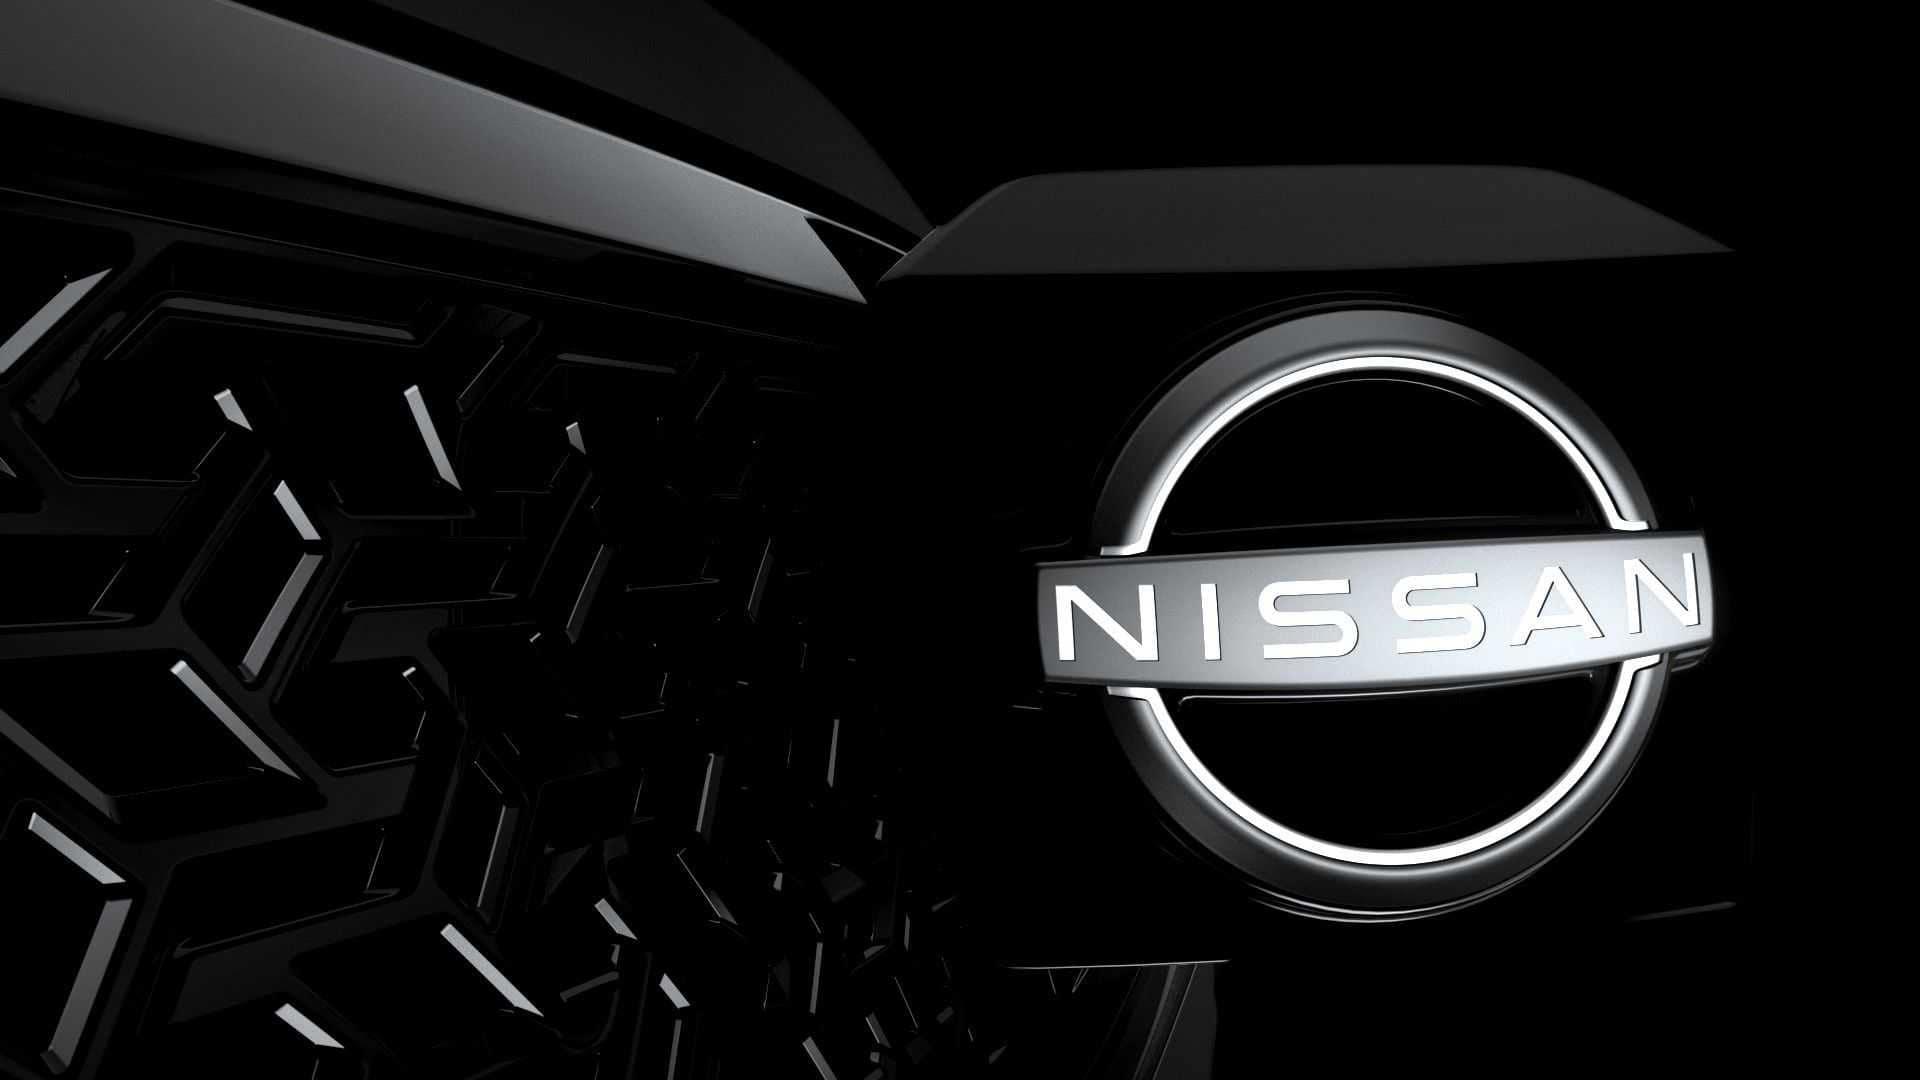 2022 Nissan Electric Van